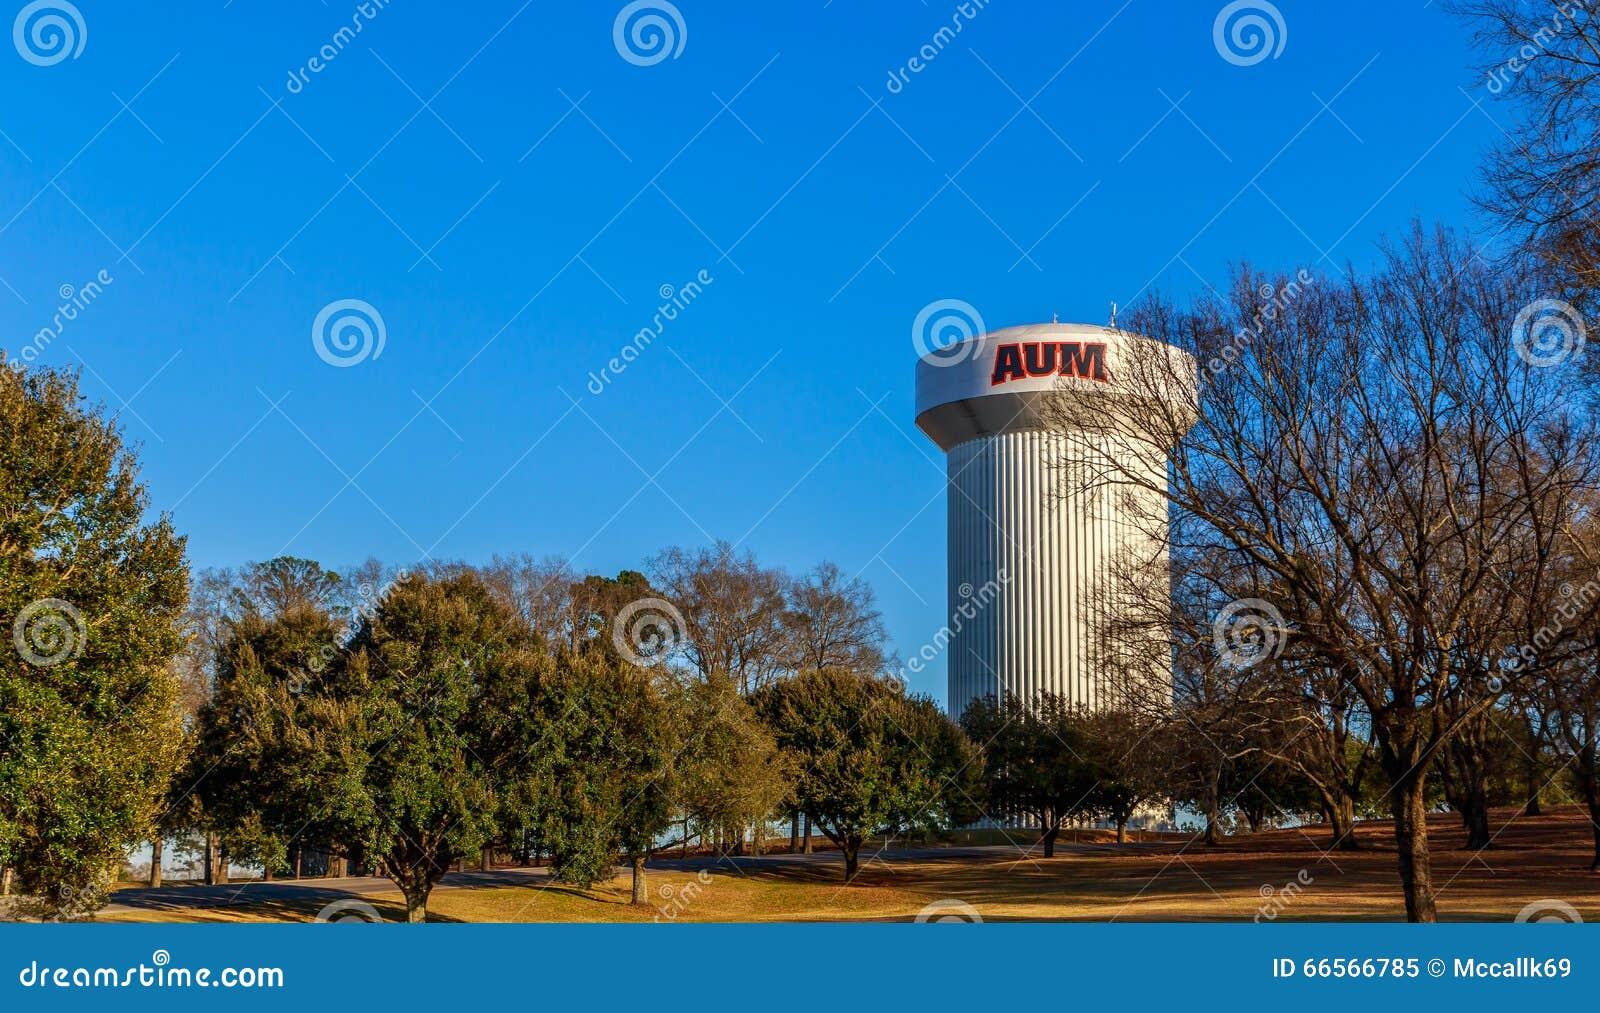 Auburn University Montgomery Water Tower in Alabama